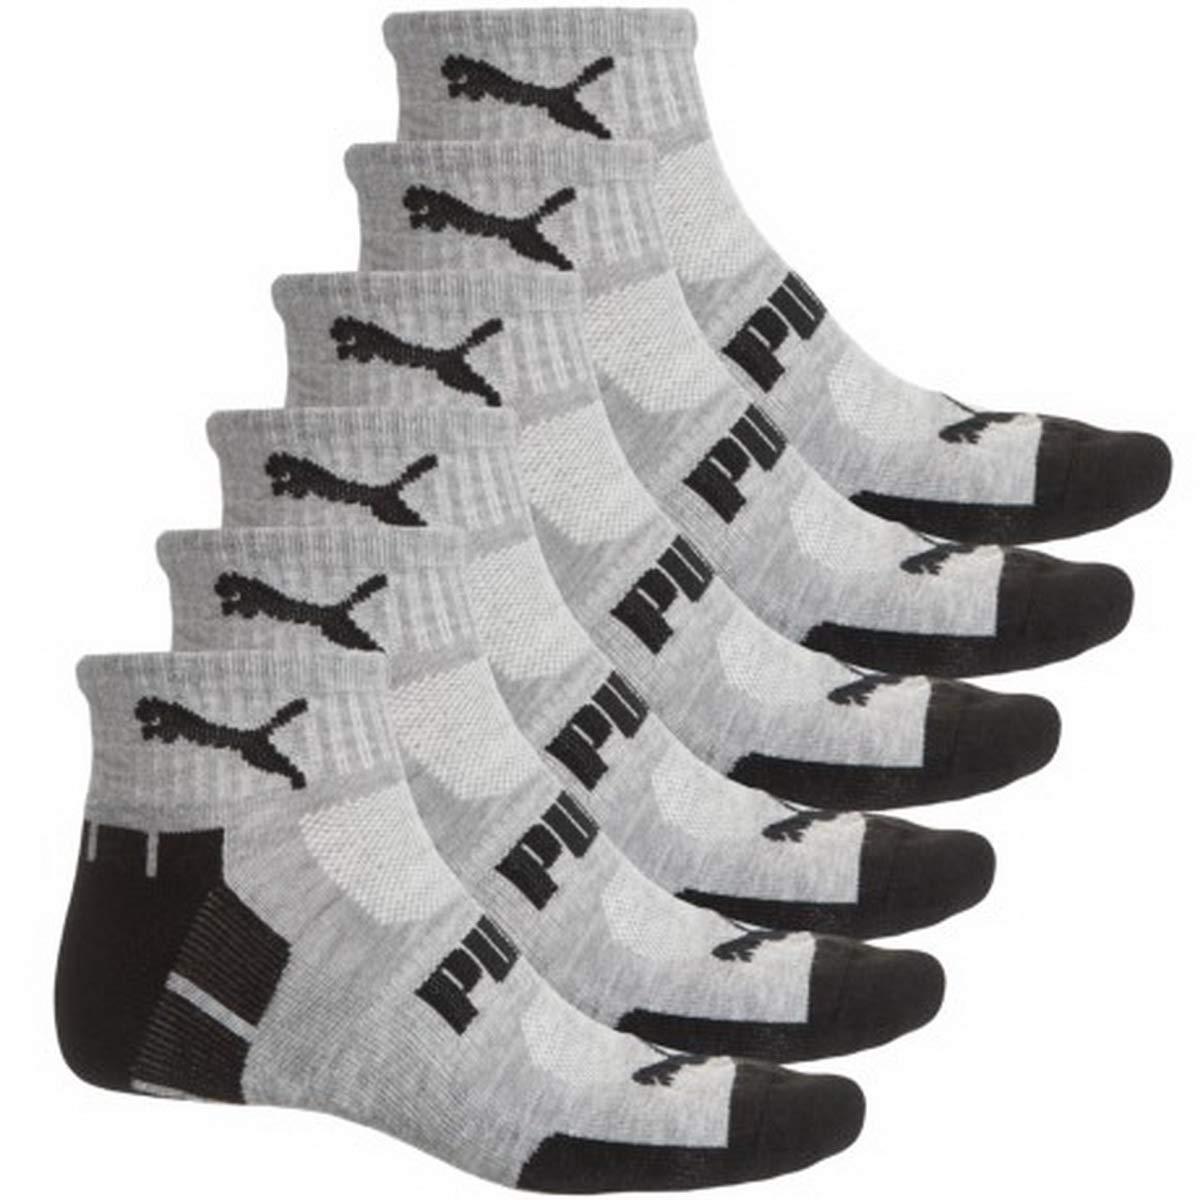 PUMA Men's 6 Pack Quarter Crew Socks (10-13, Gray/Gray/Black) by PUMA